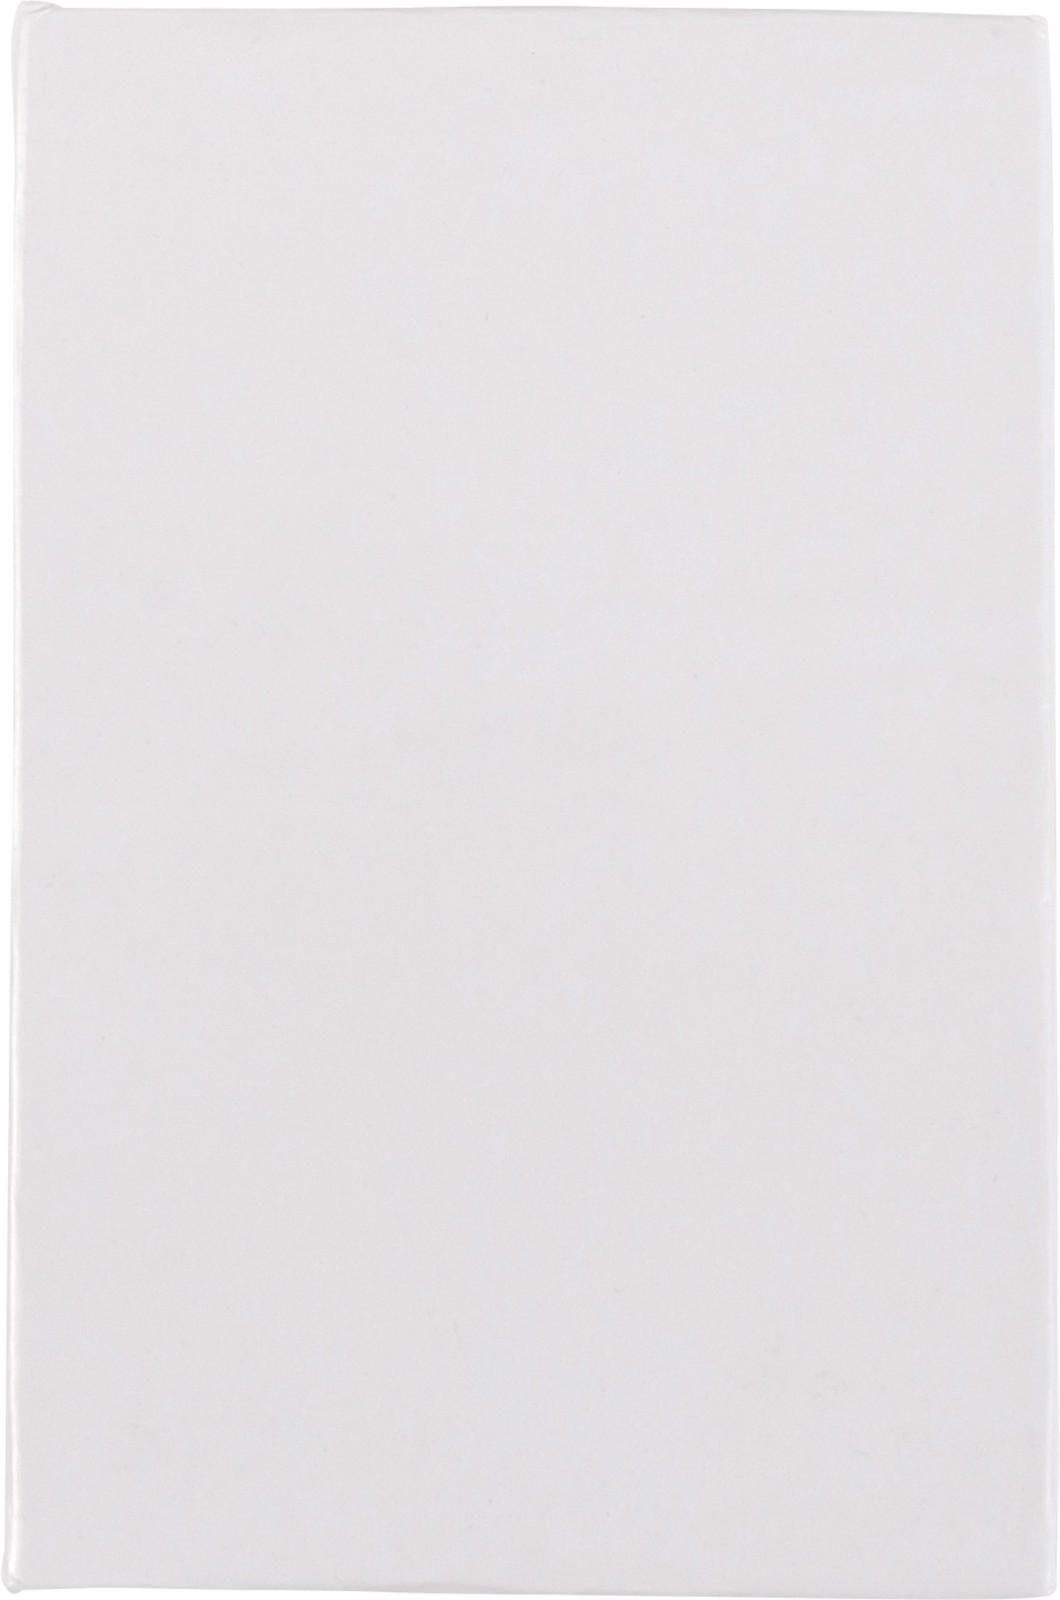 Cardboard sticky note holder - White